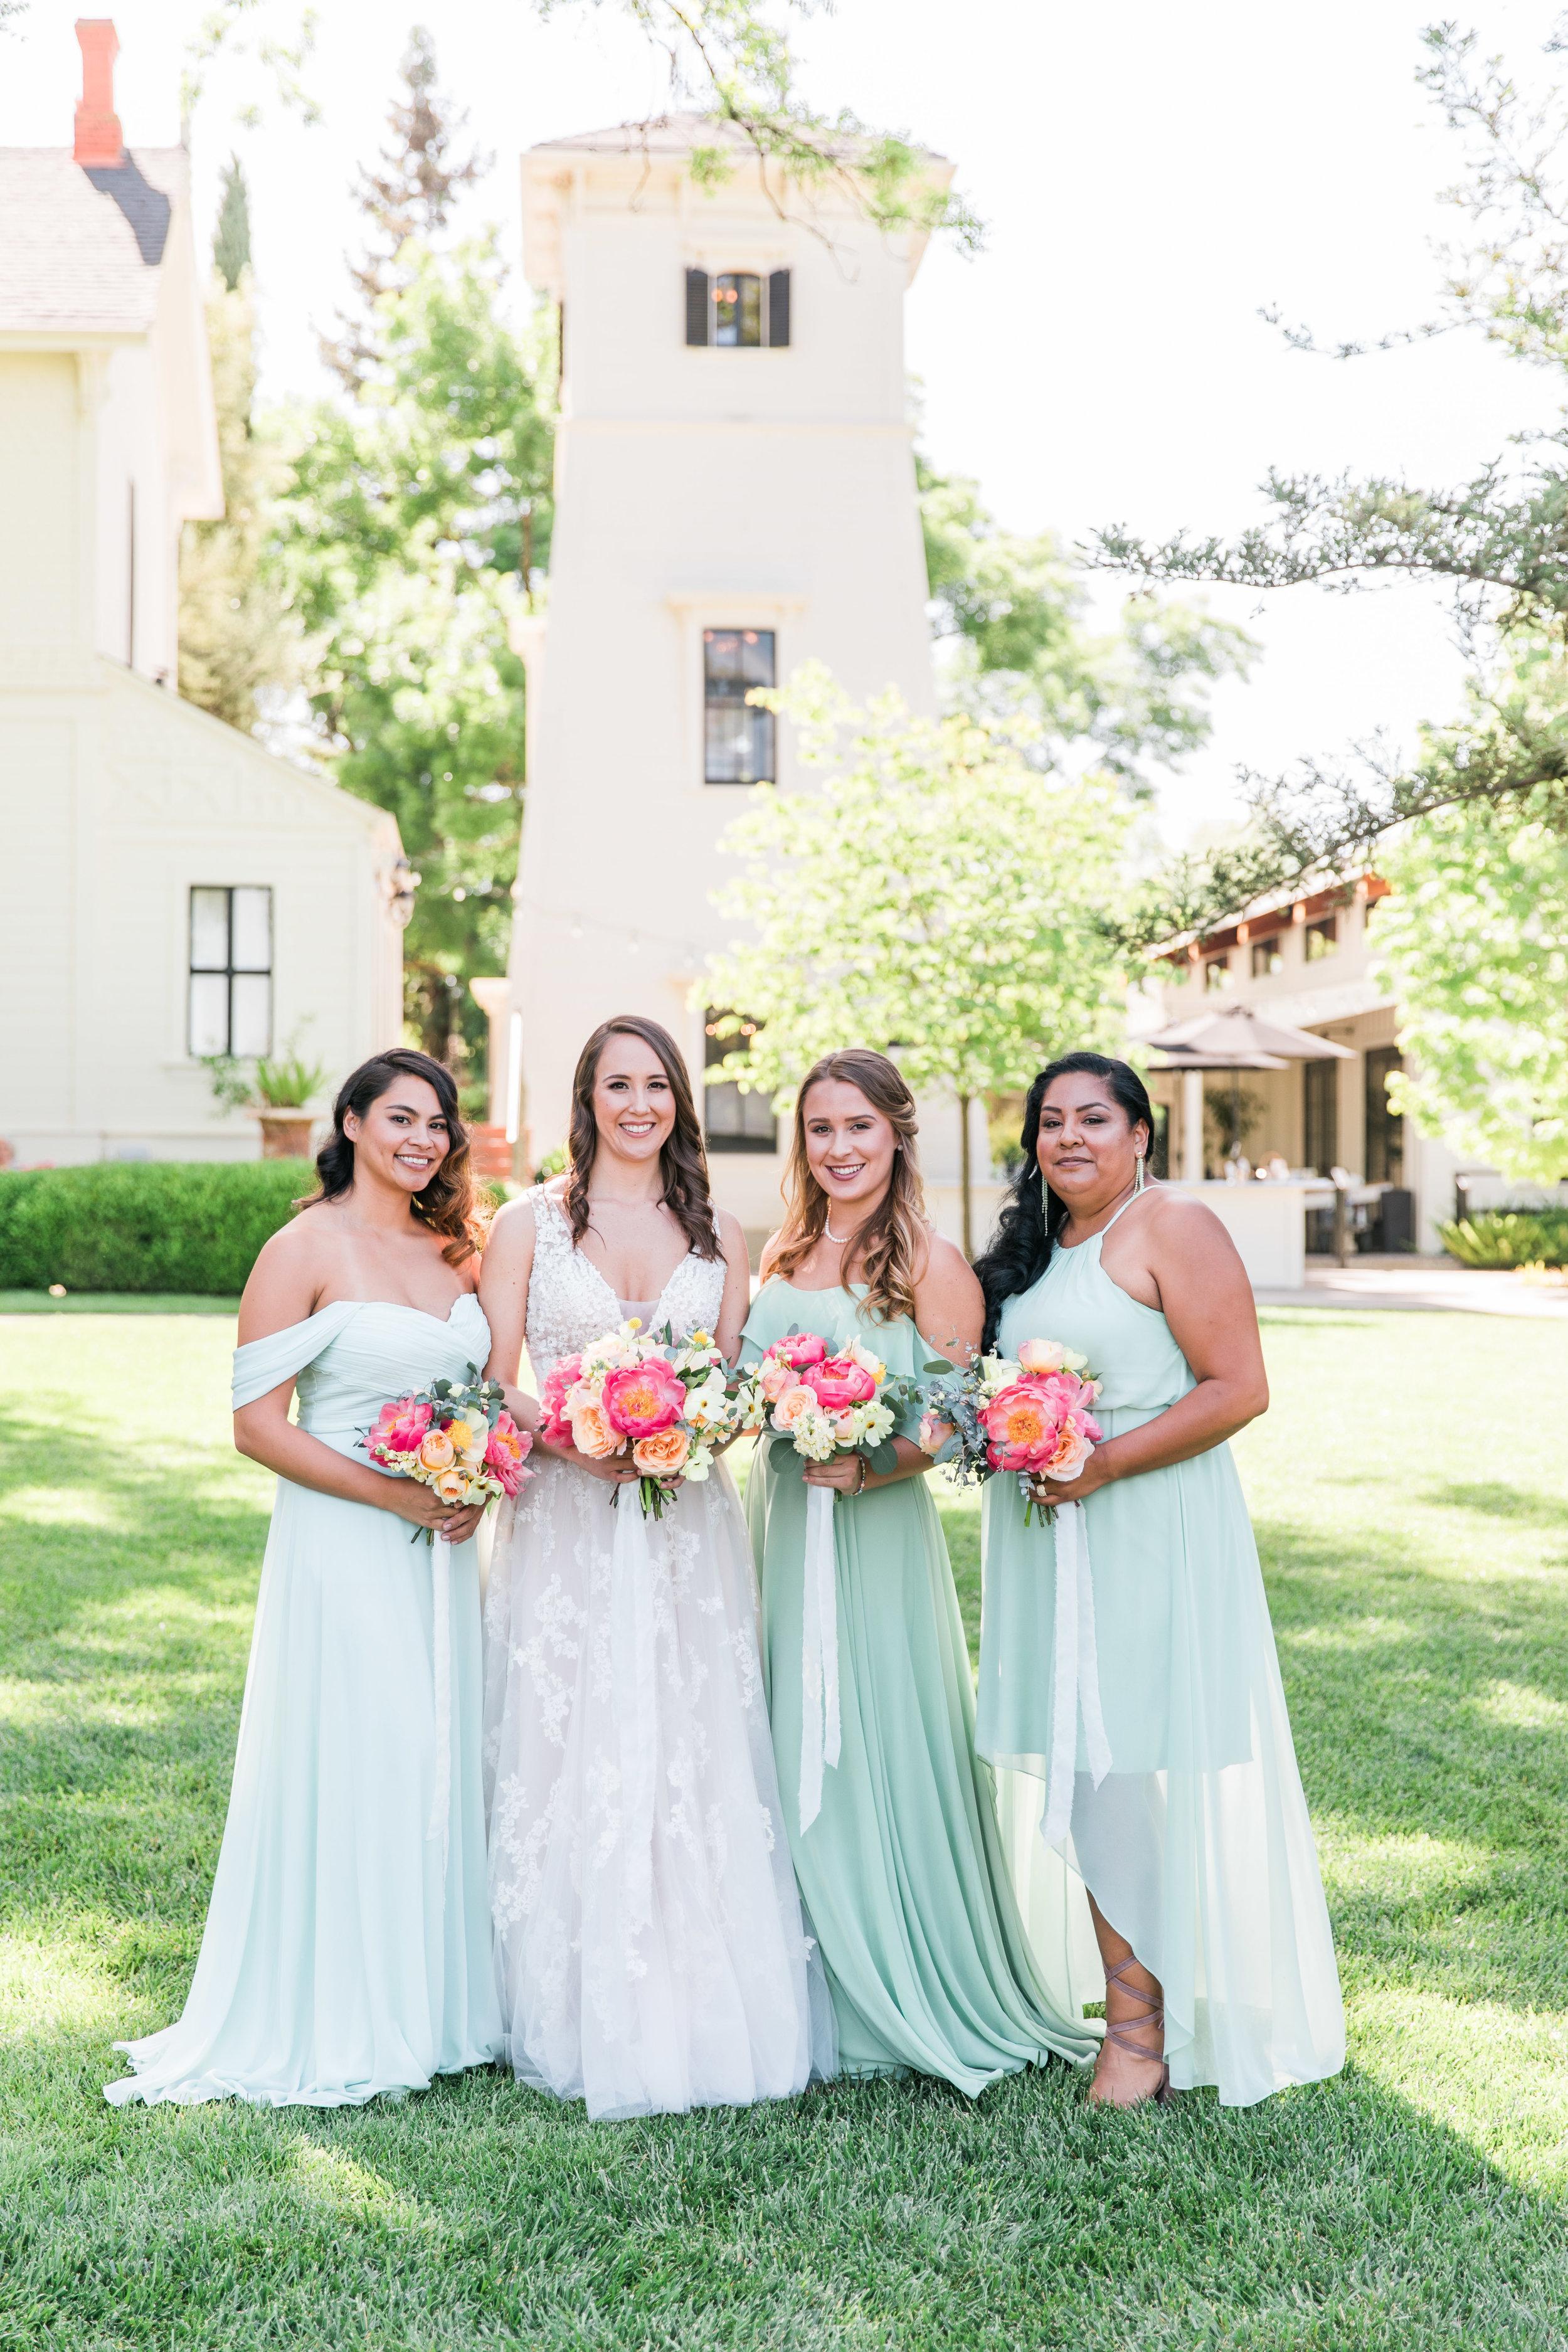 Tess-Jesse-Wedding-SP-by-JBJ-Pictures-8.jpg